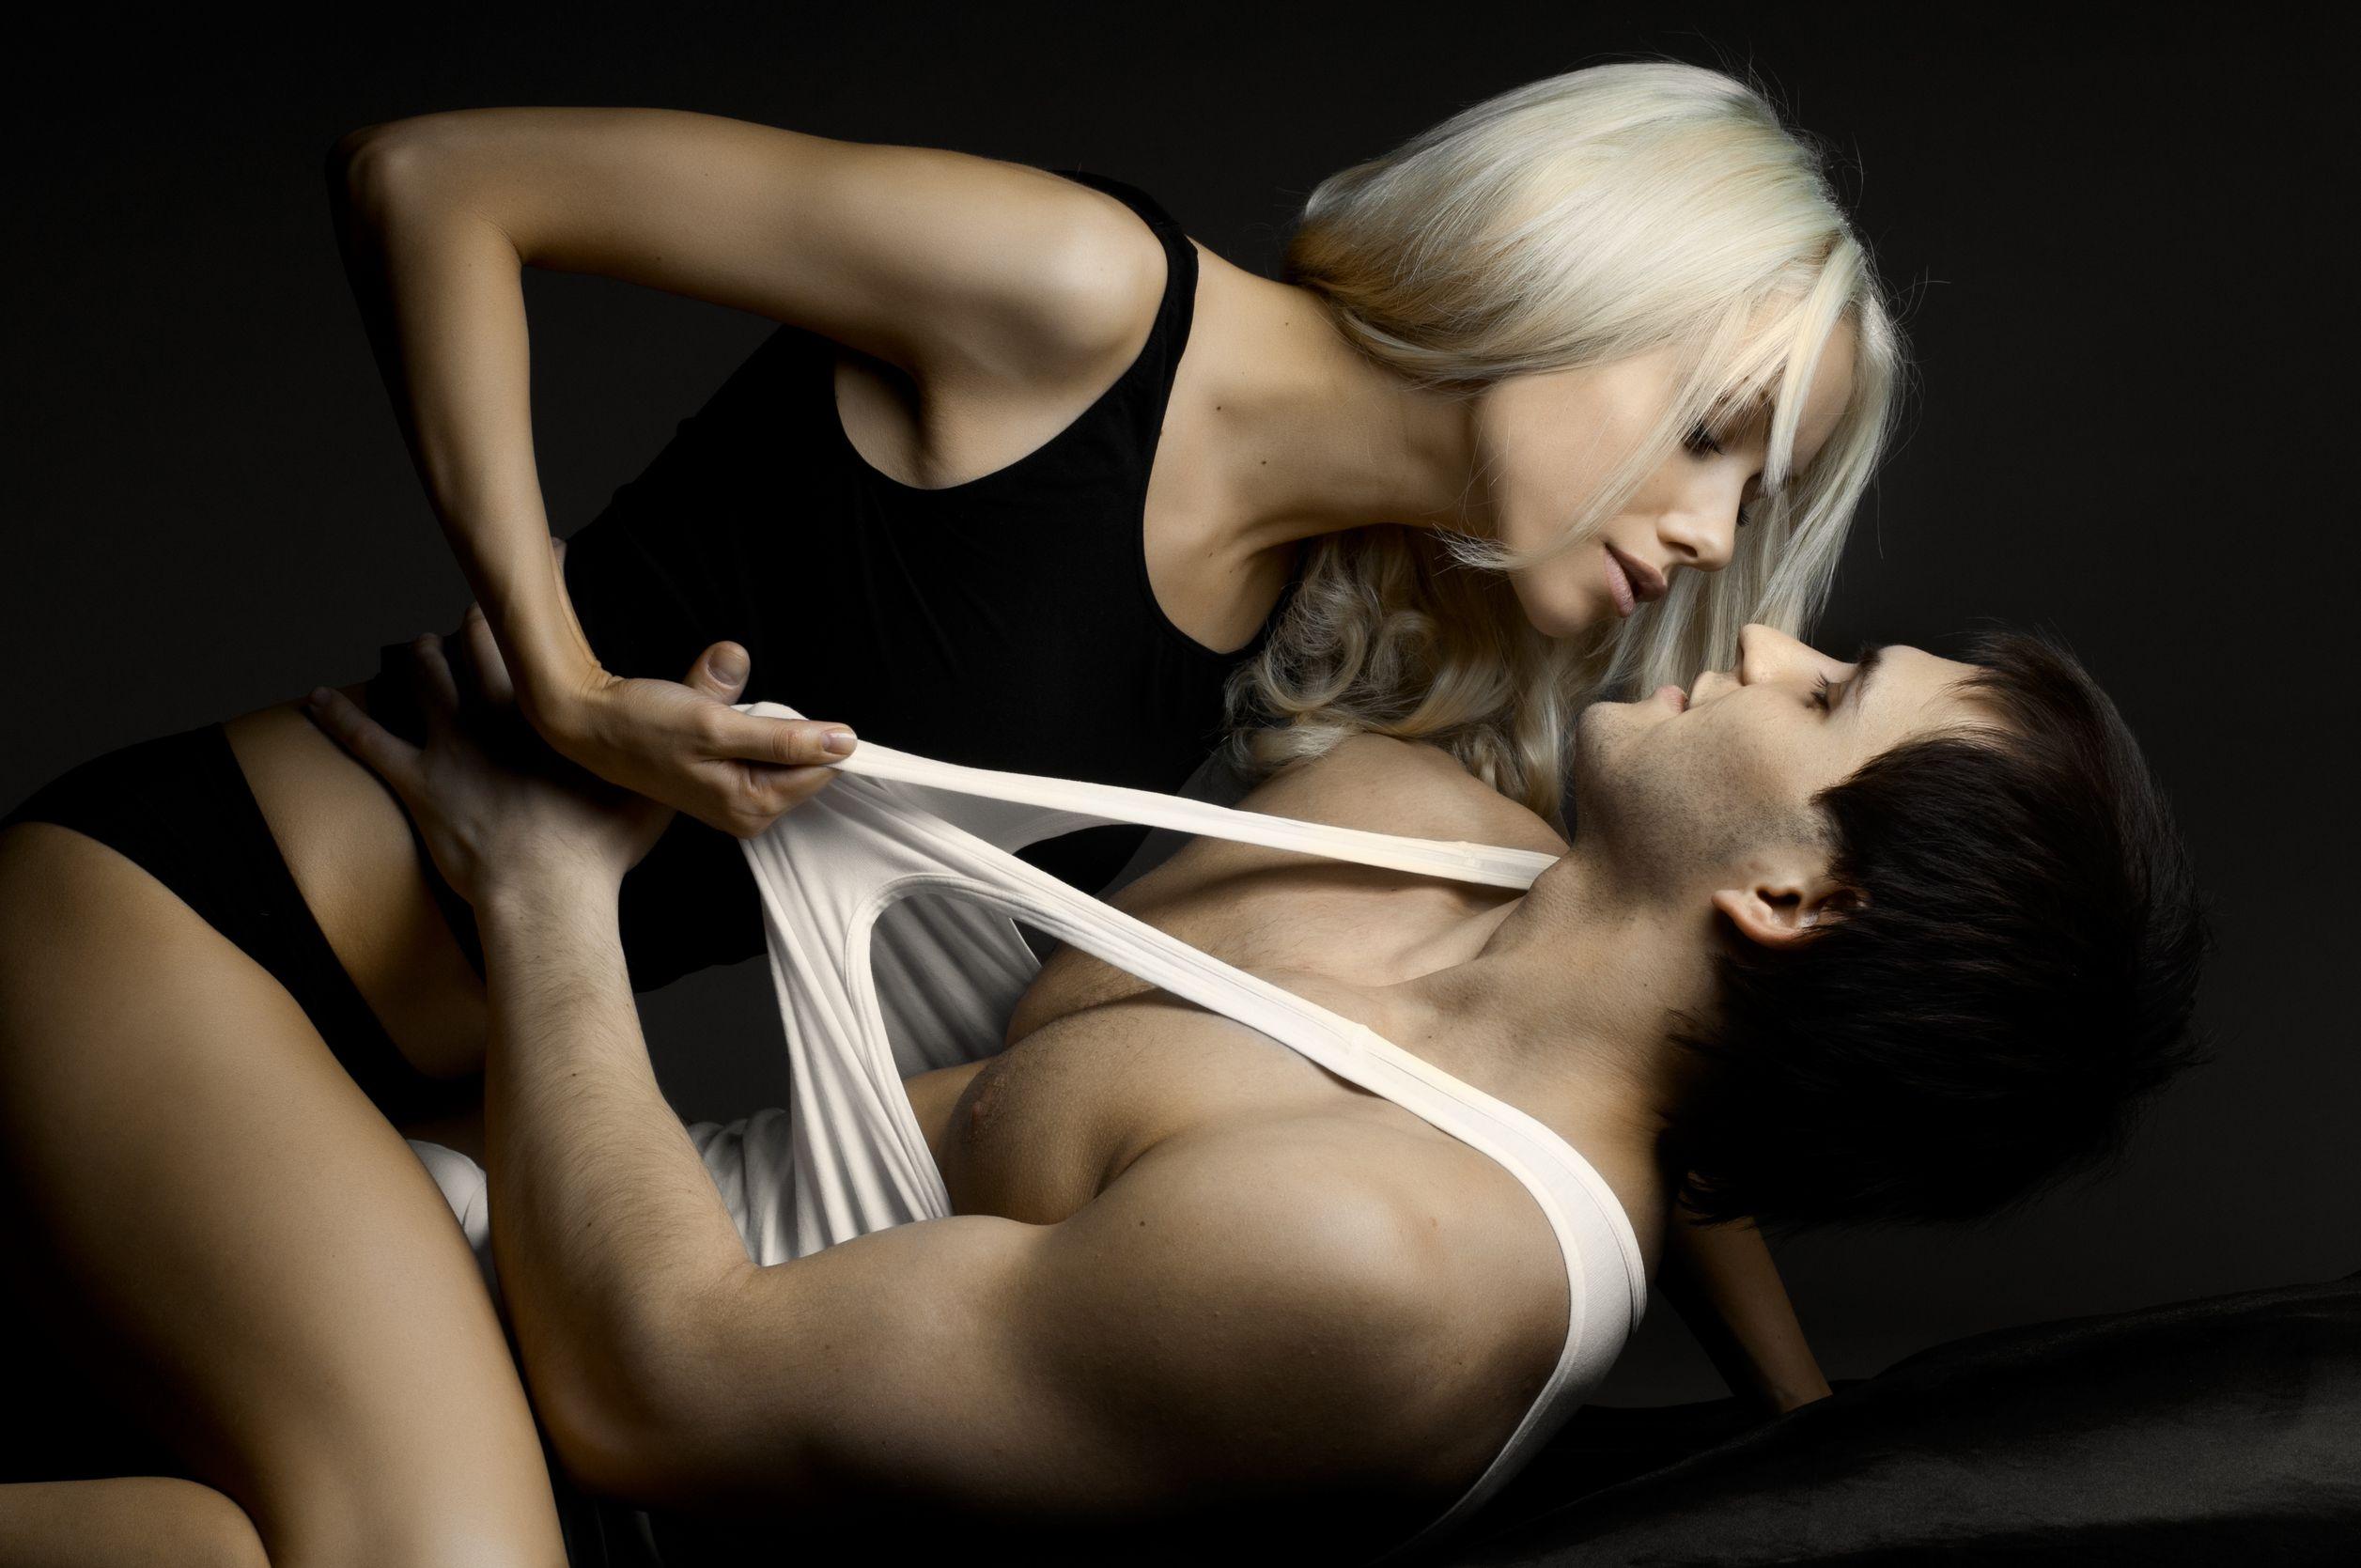 dloha videa jak delat sex